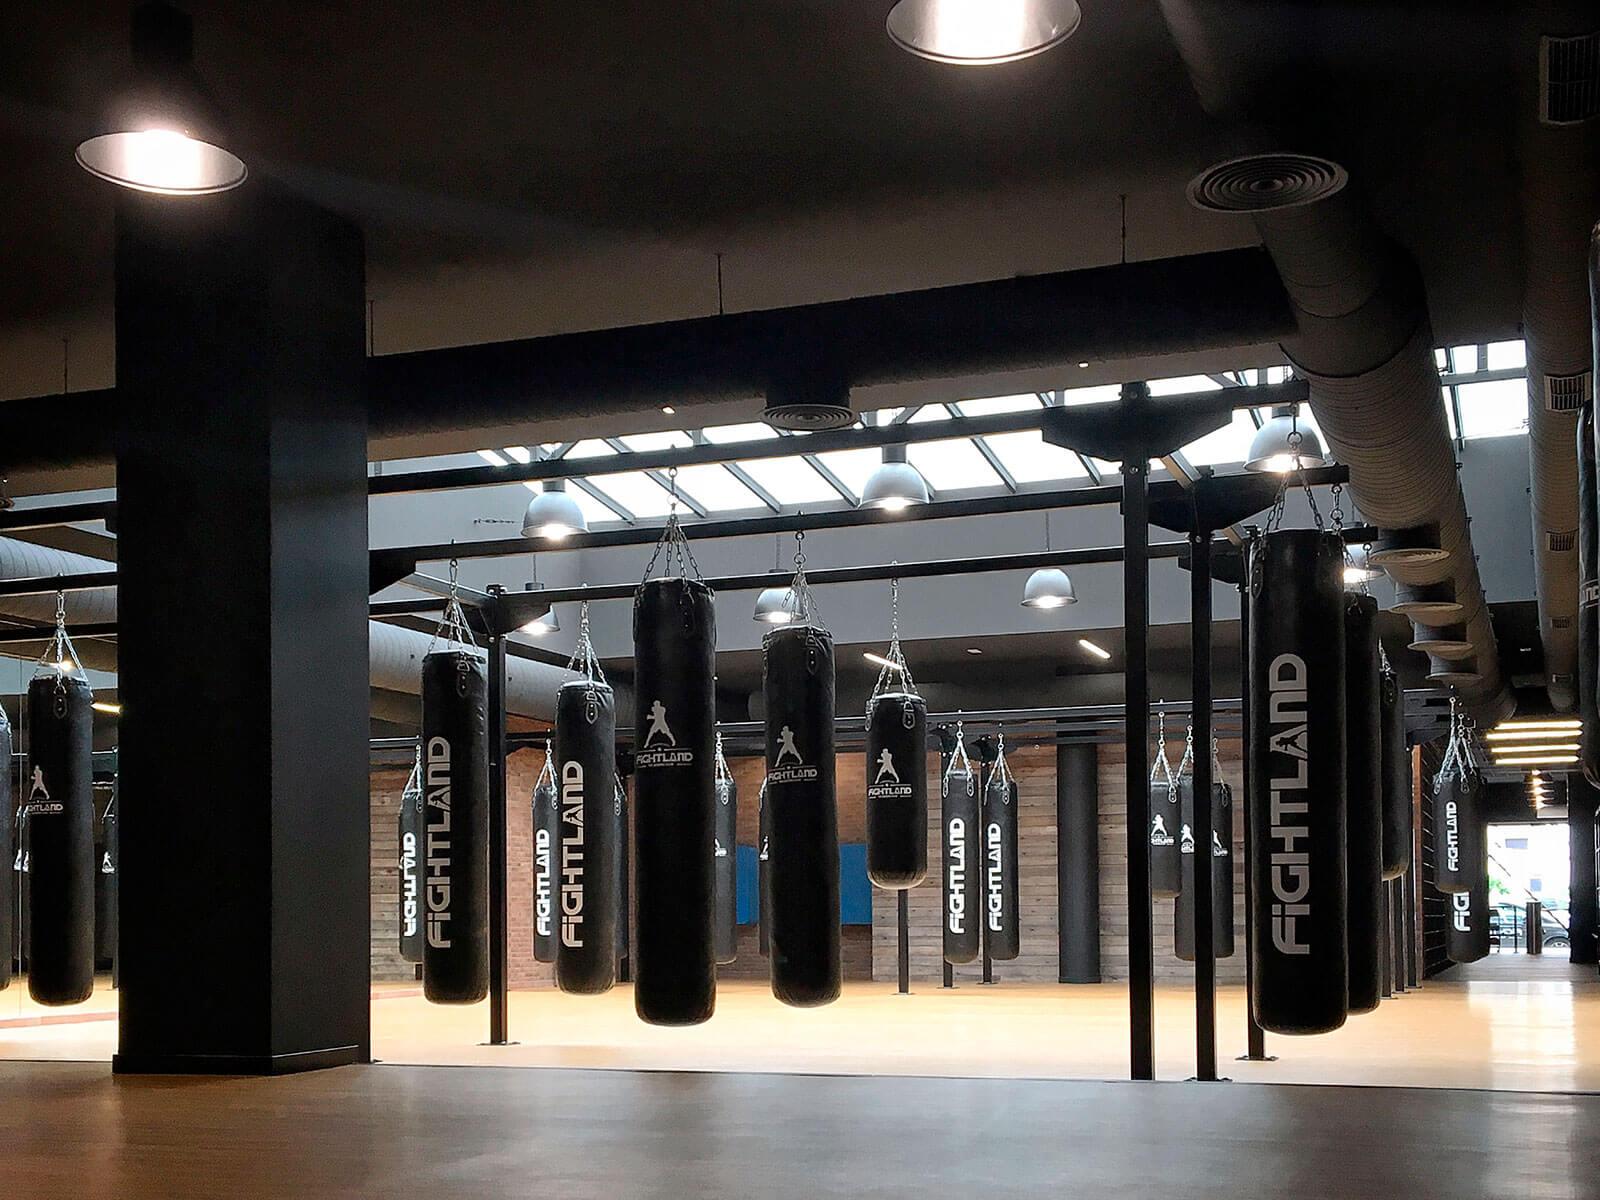 clases de boxeo en a coruna